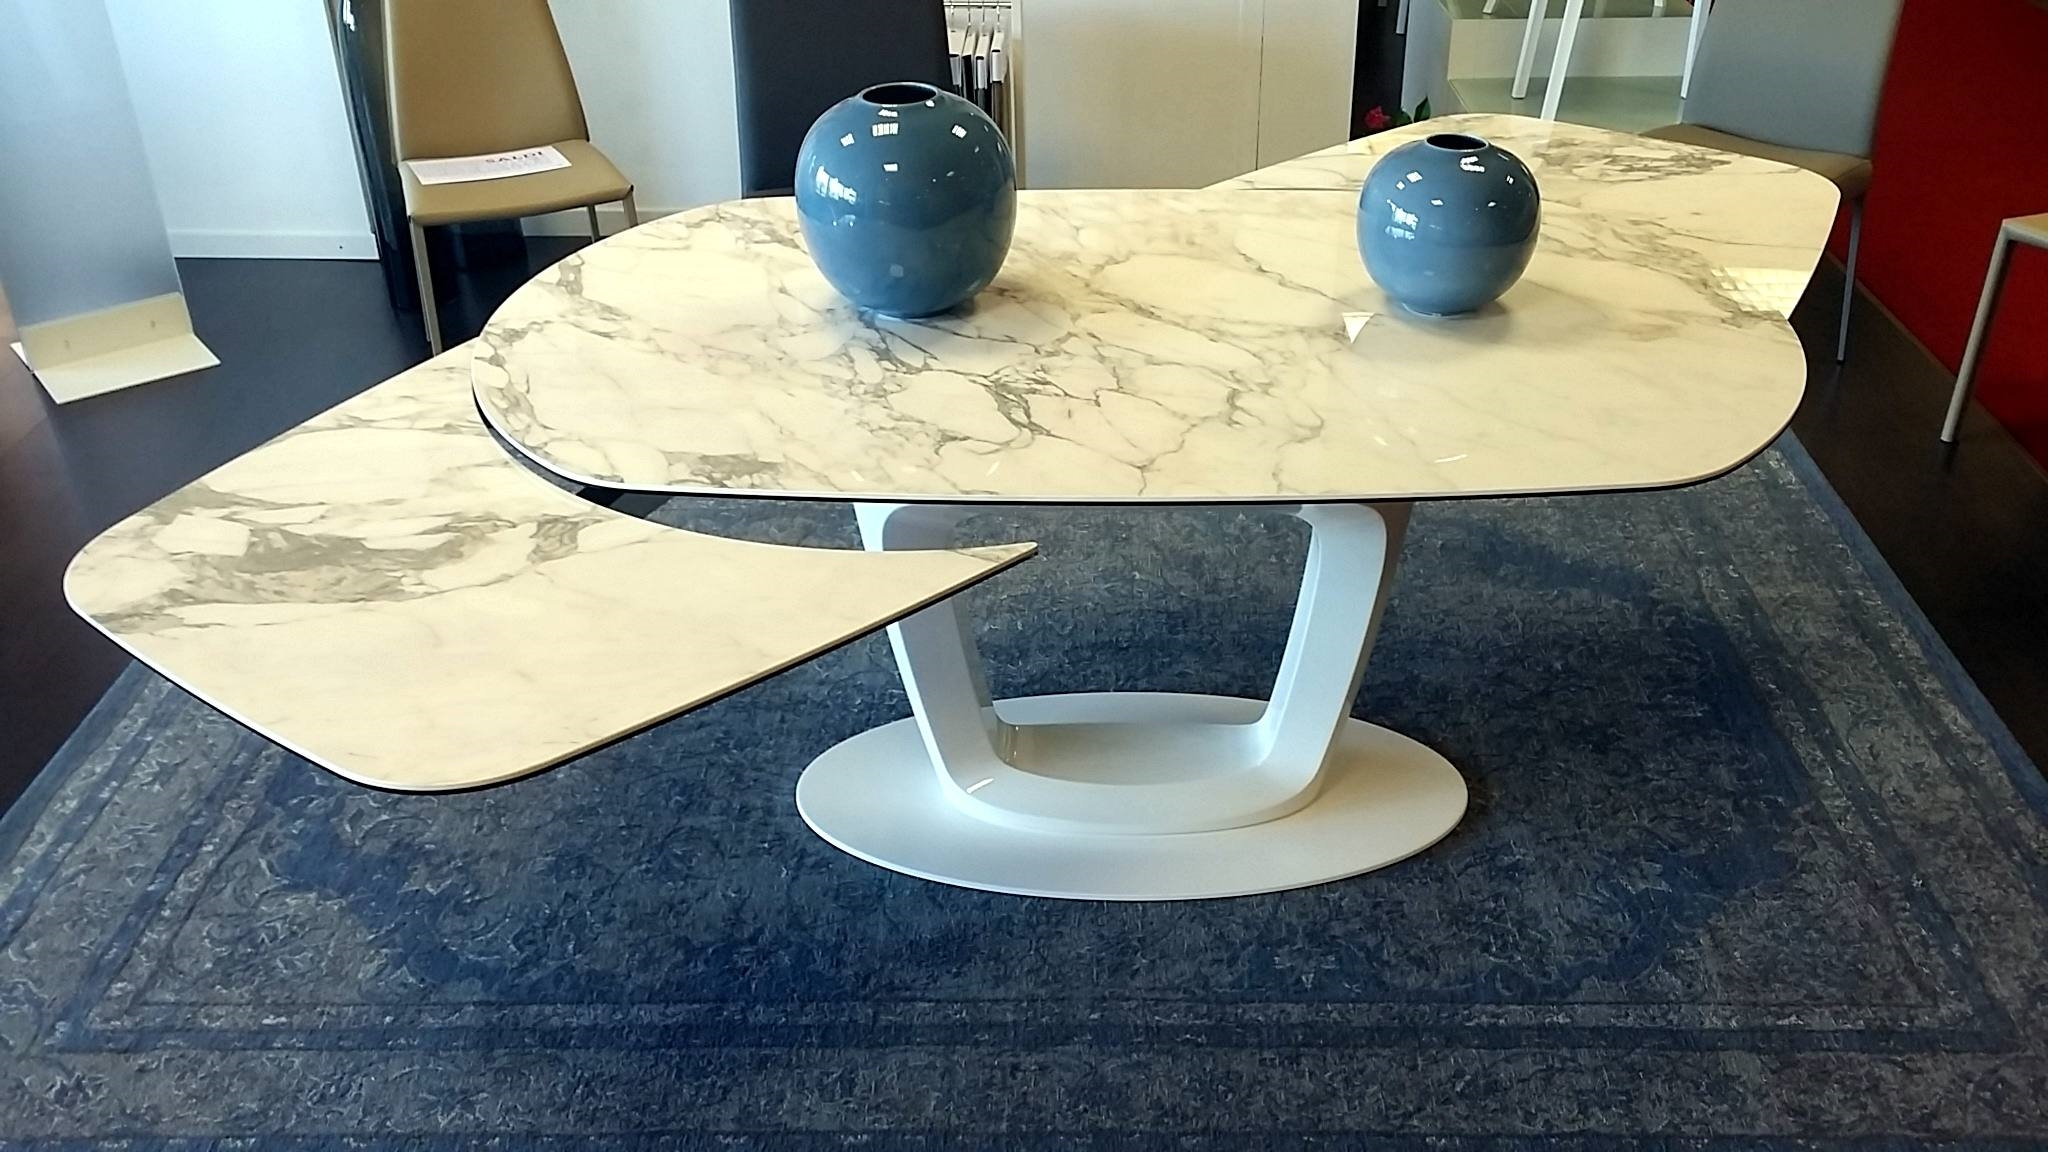 Outlet tavolo calligaris orbital tavoli a prezzi scontati for Tavolo orbital calligaris offerte